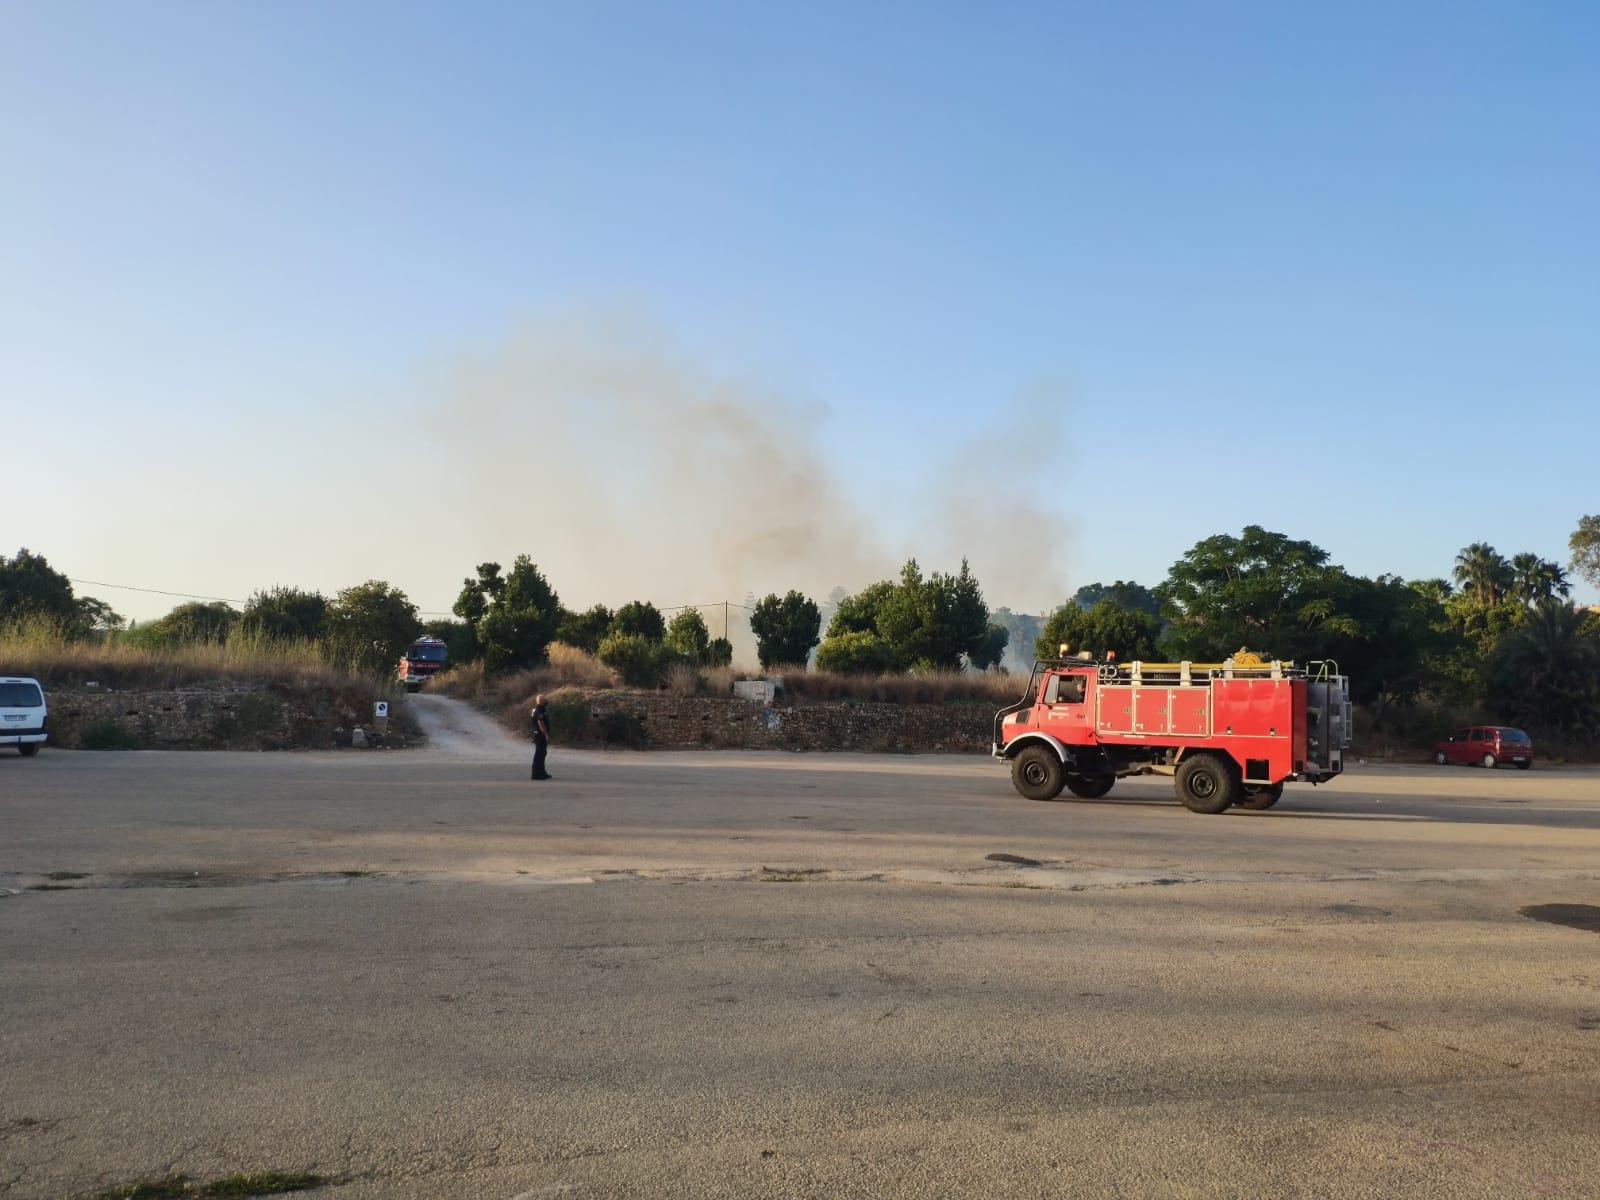 Camión de bomberos en Torrecremada